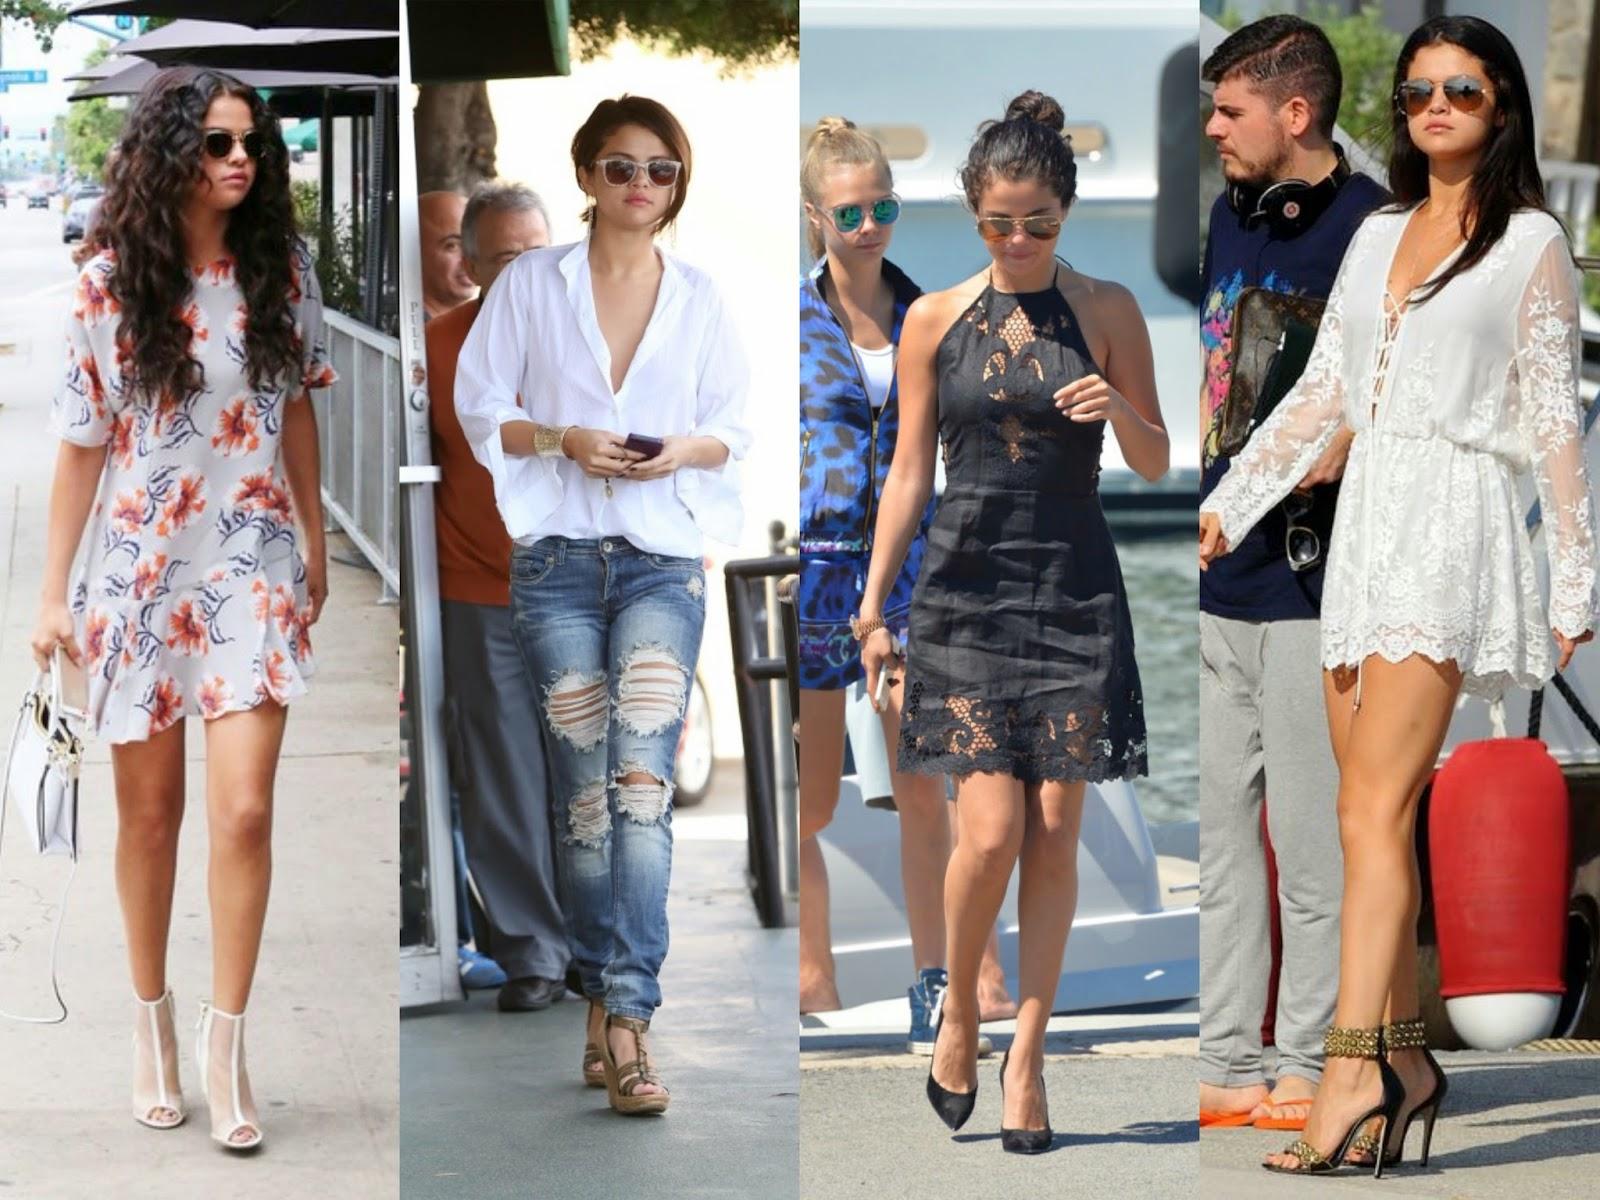 A Generic Giraffe Stylespo Sunday Selena Gomez Favorite Outfits